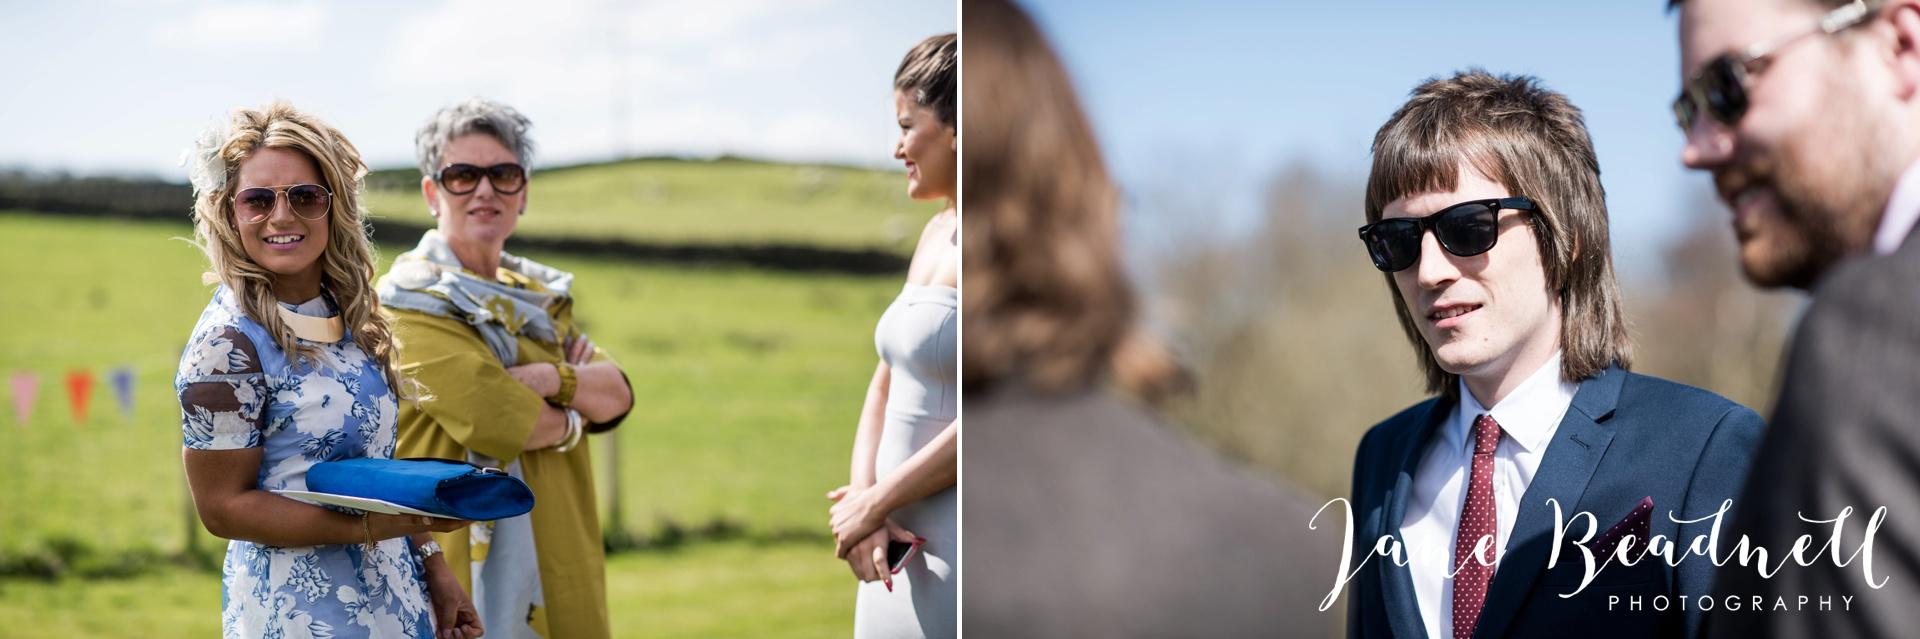 Jane Beadnell fine art wedding photographer The Cheerful Chilli Barn Otley_0002